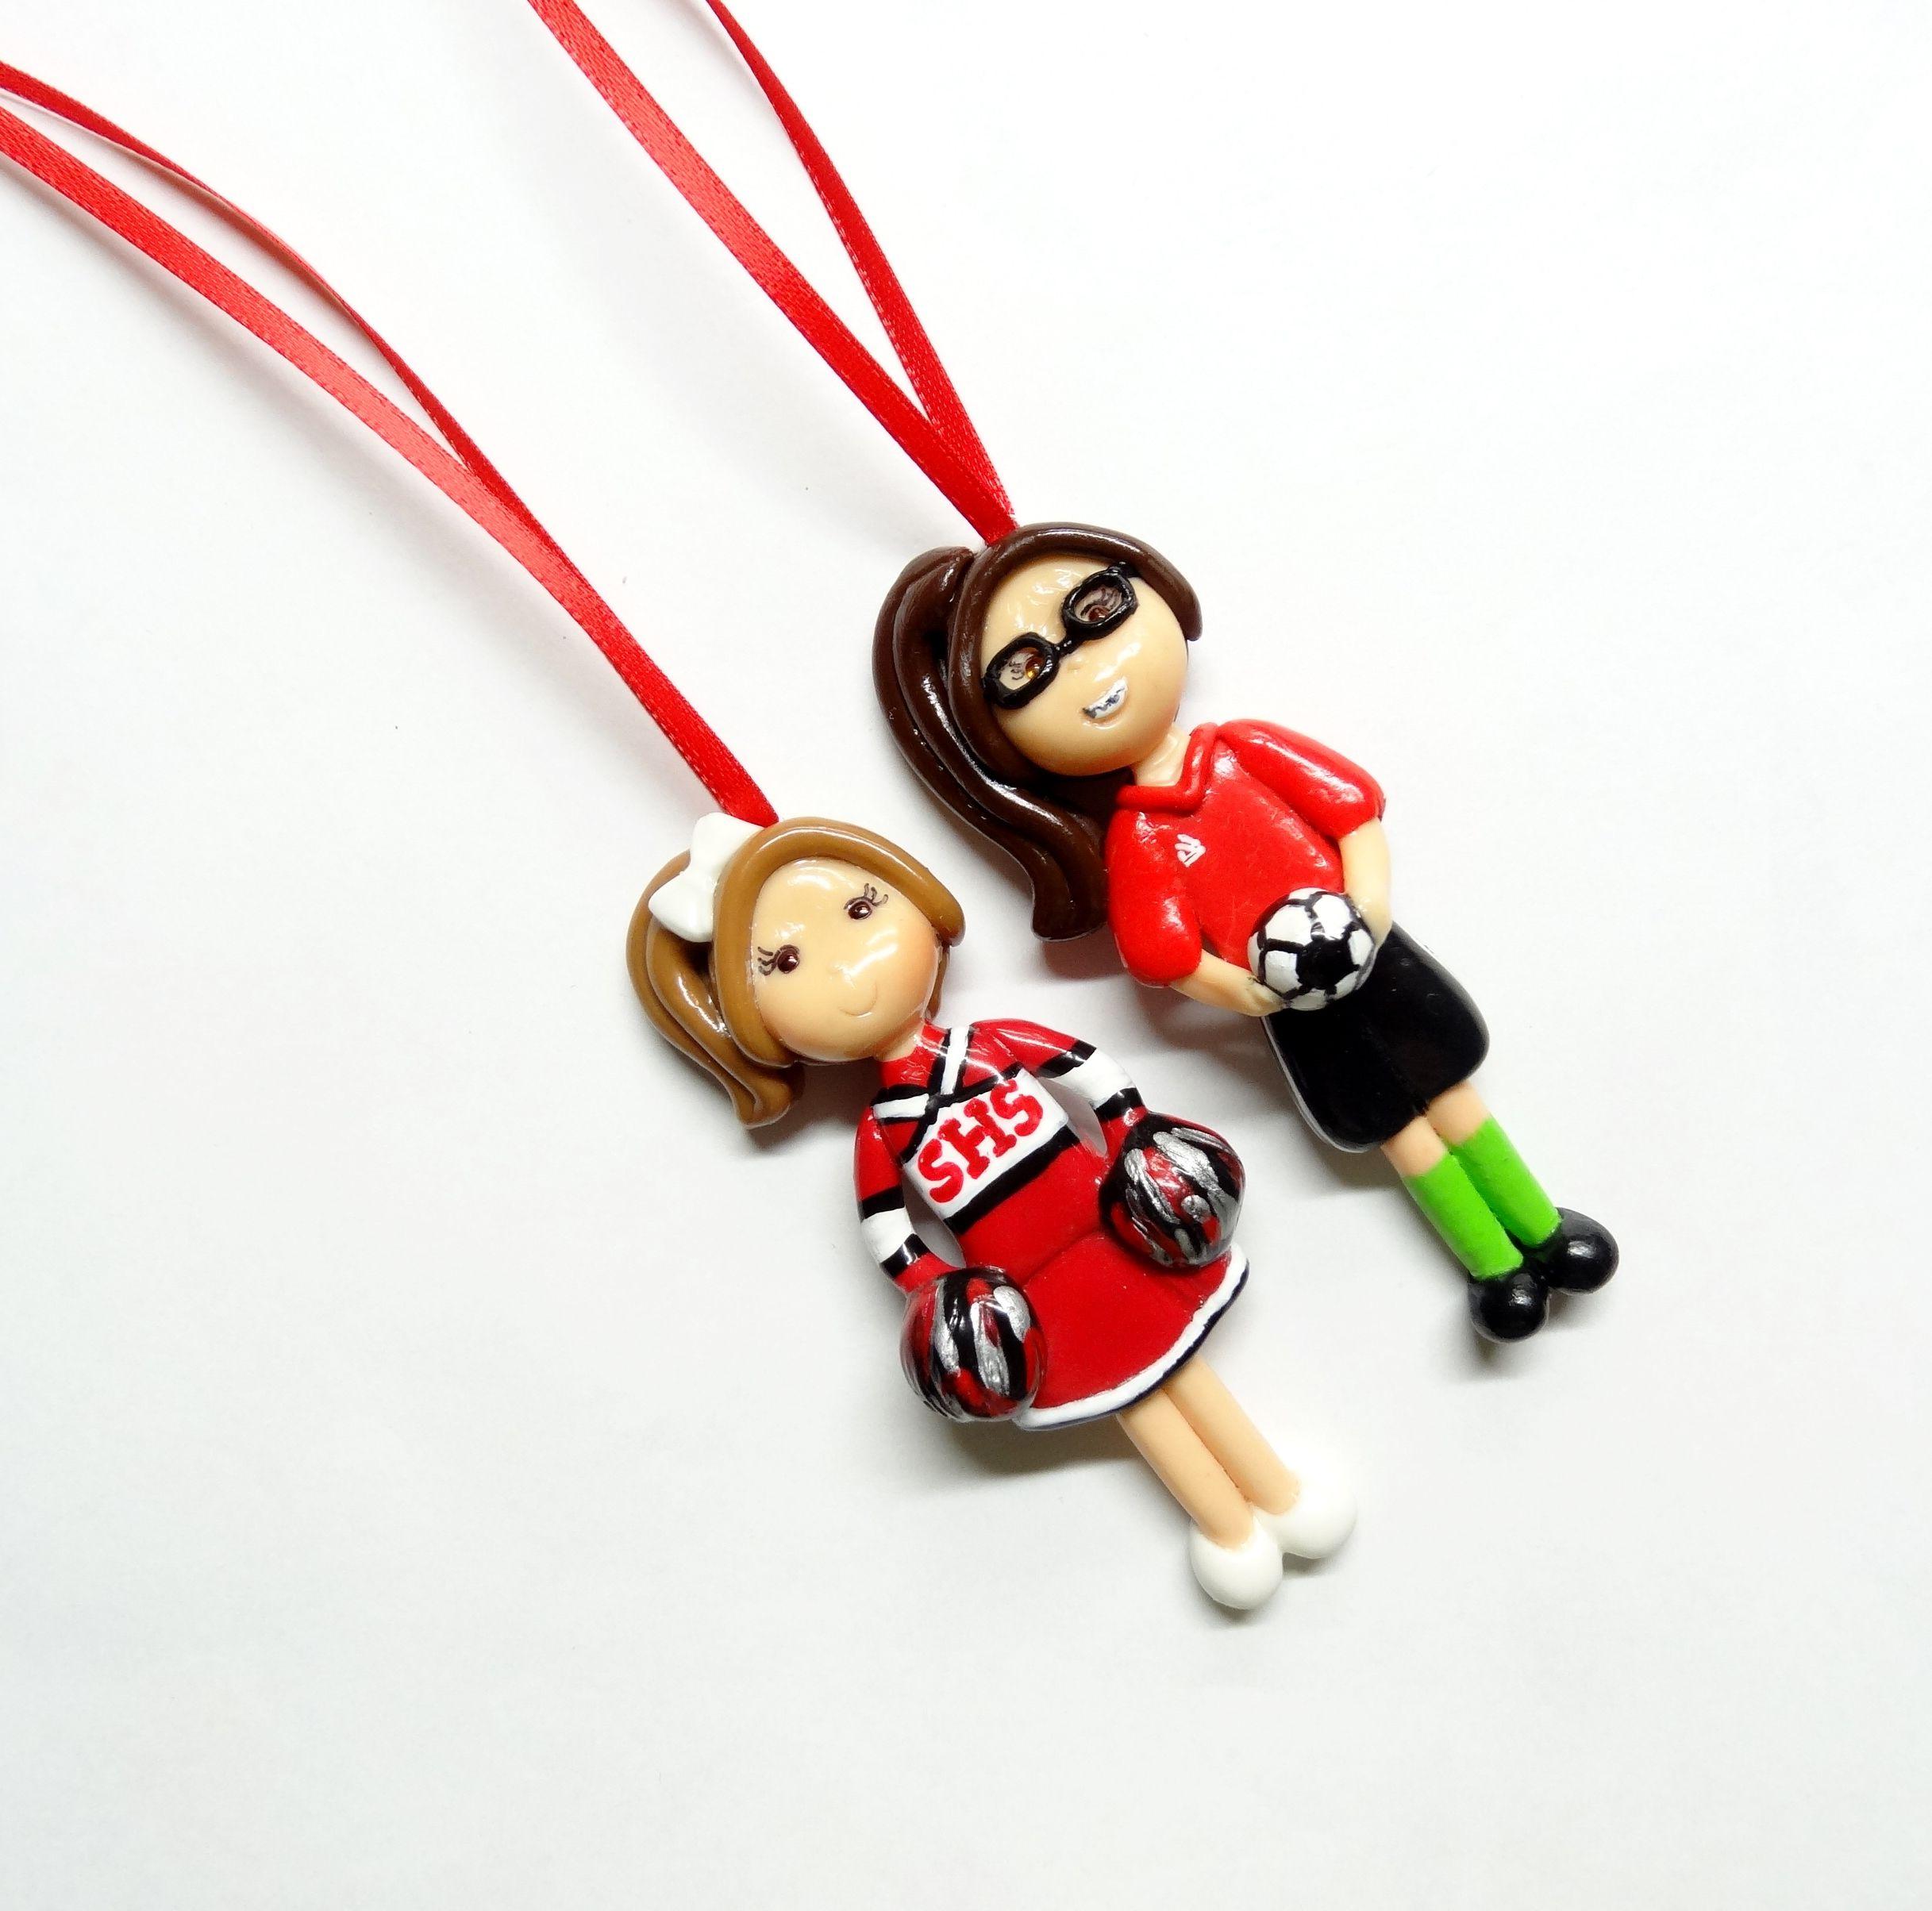 Soccer ornaments - Custom Cheerleader And Soccer Player Girl Ornaments